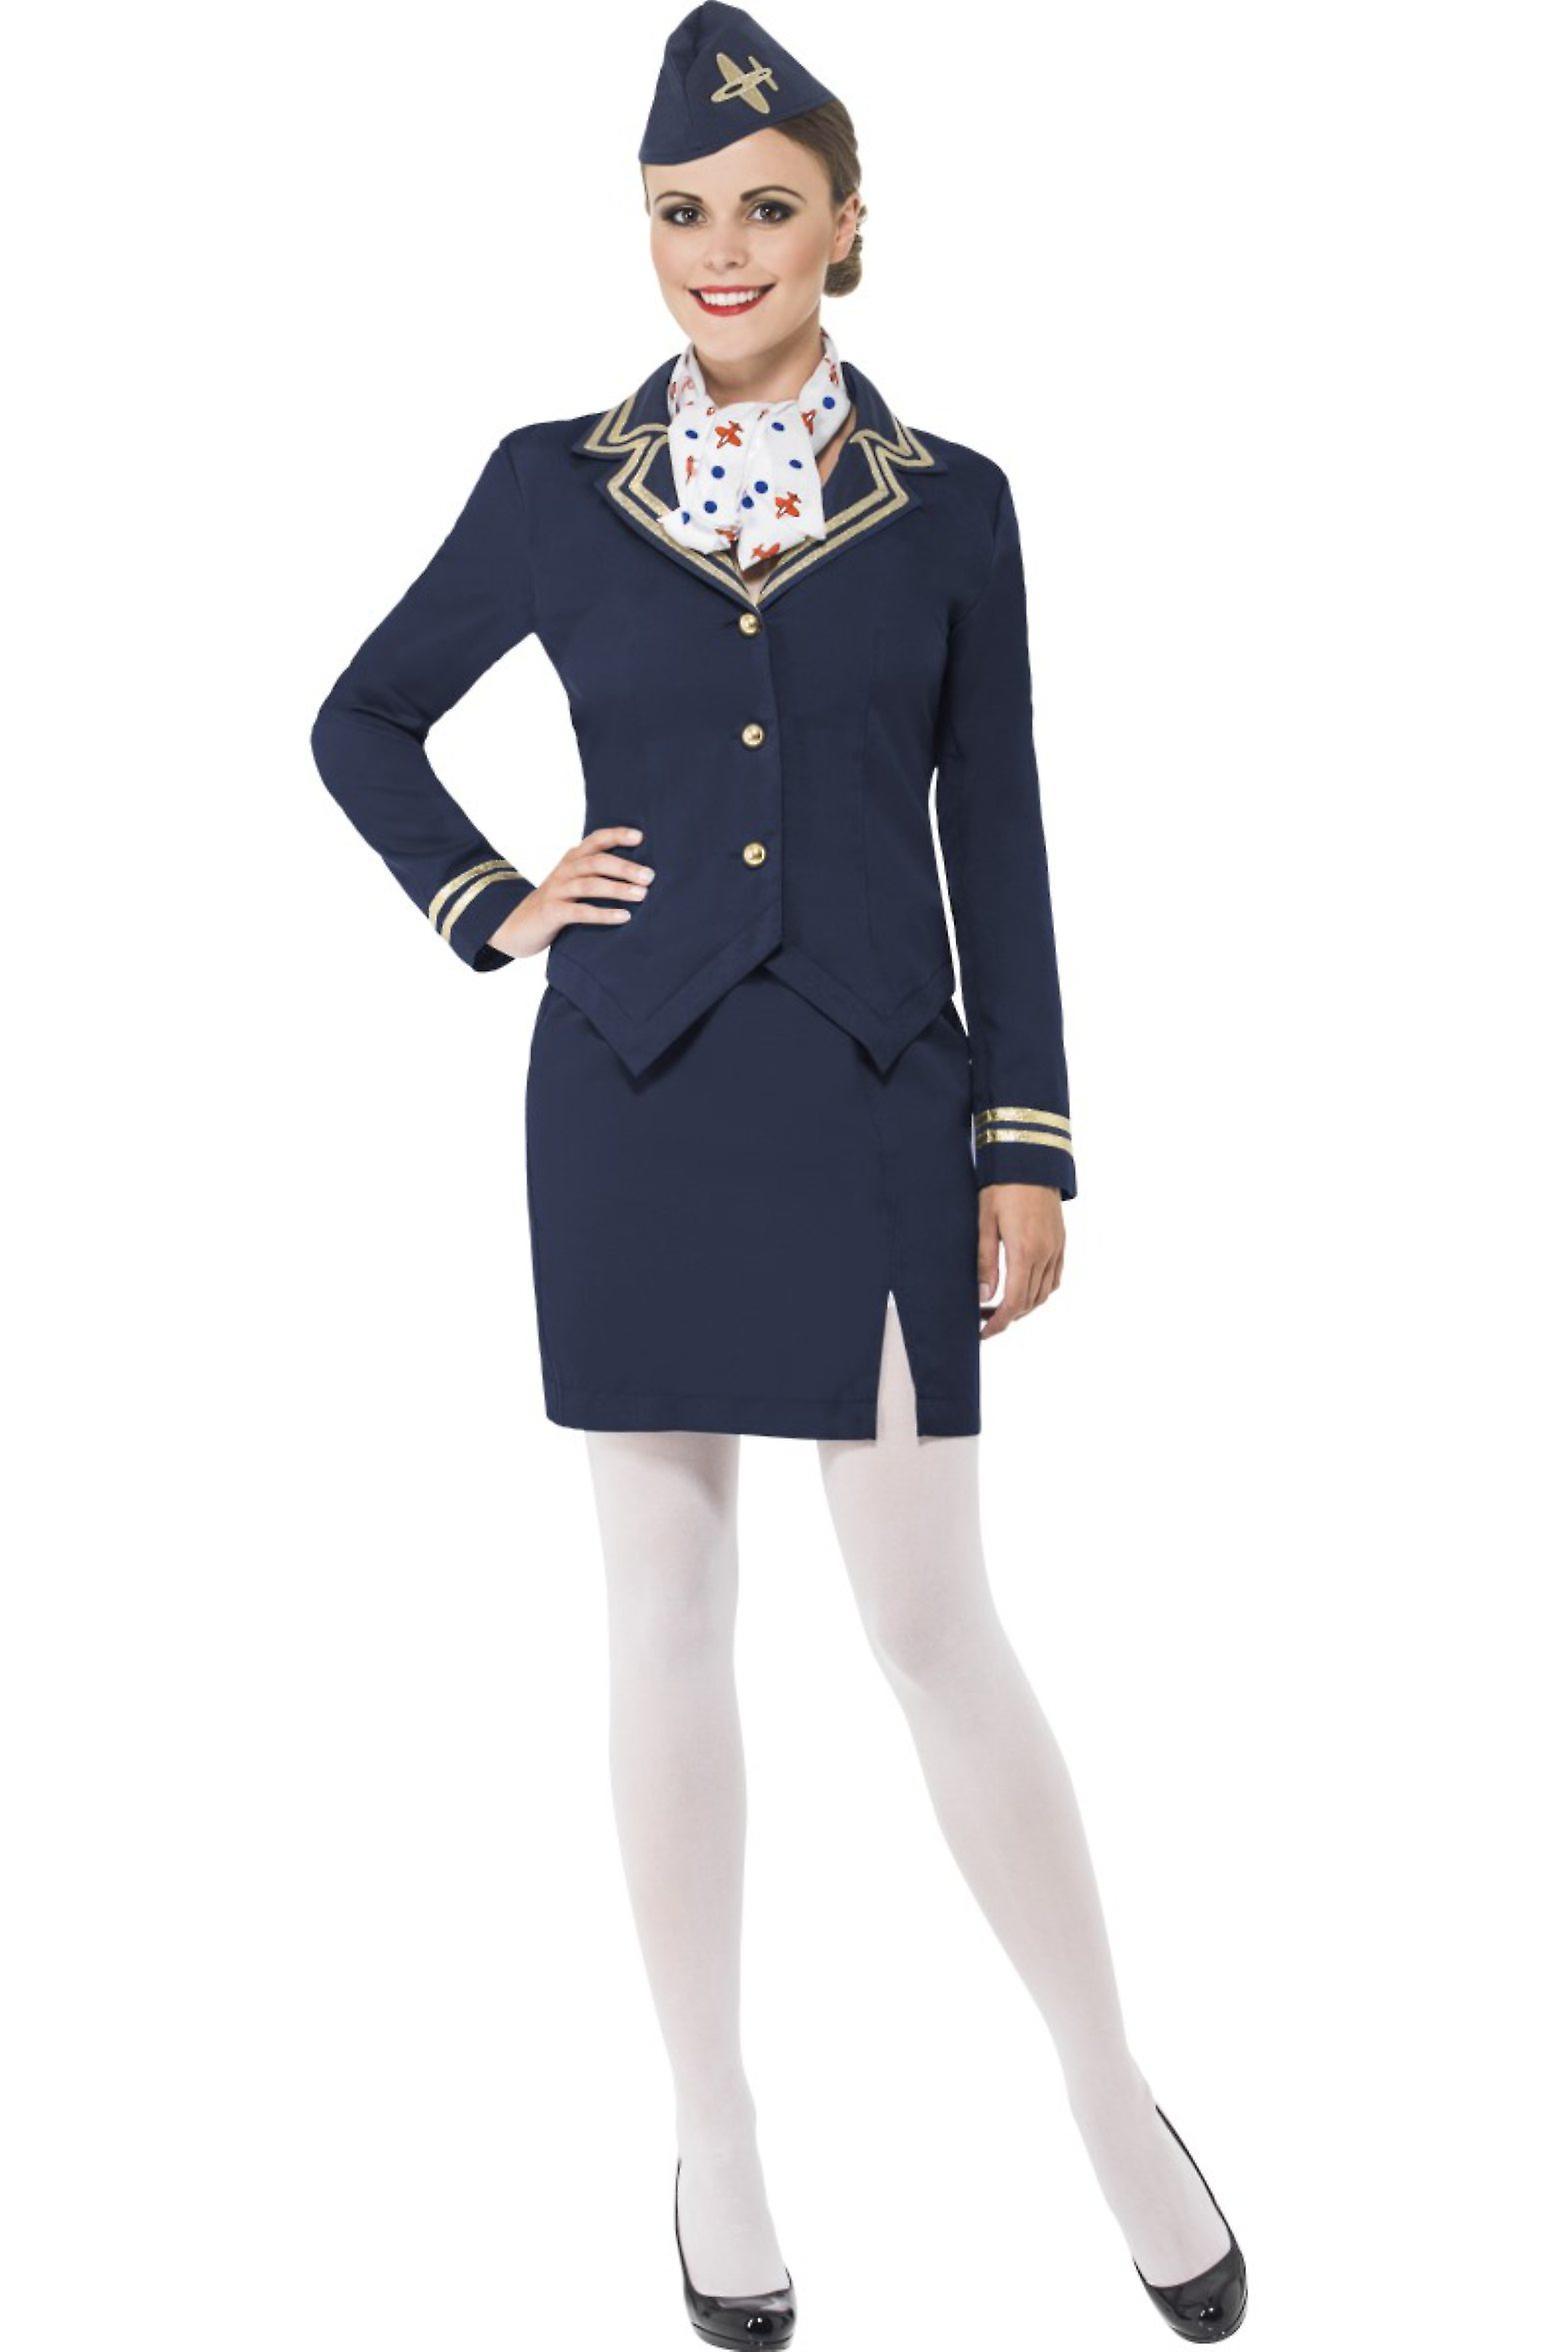 cb4c2f1a Kvinder kostumer stewardesse fancy kjole kostume xl   Fruugo